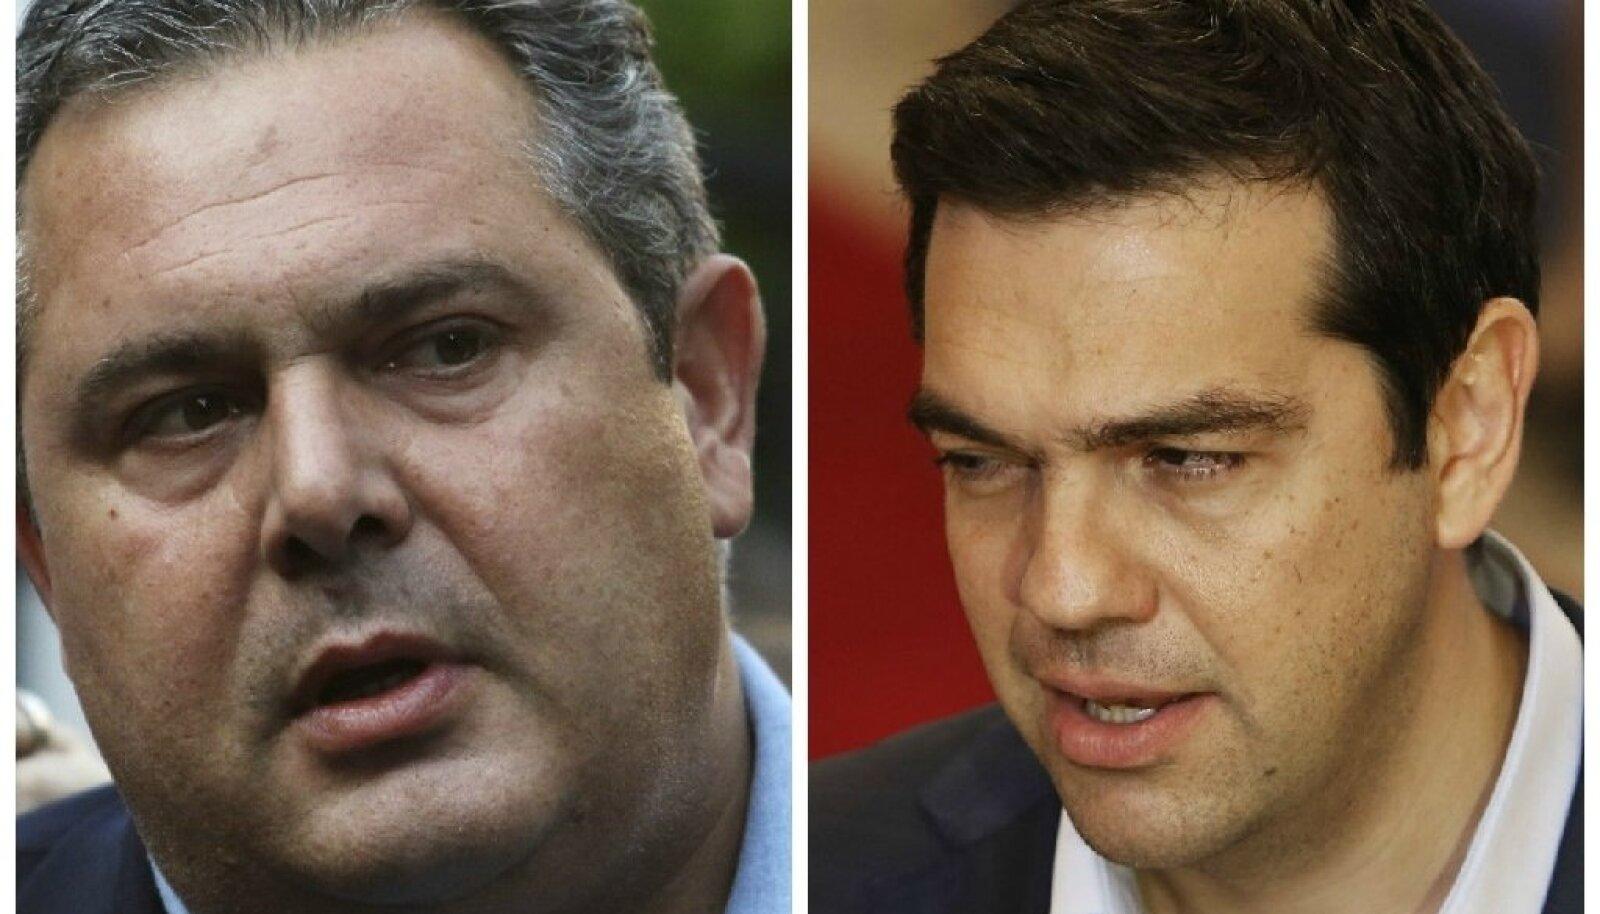 Kammenos ja Tsipras